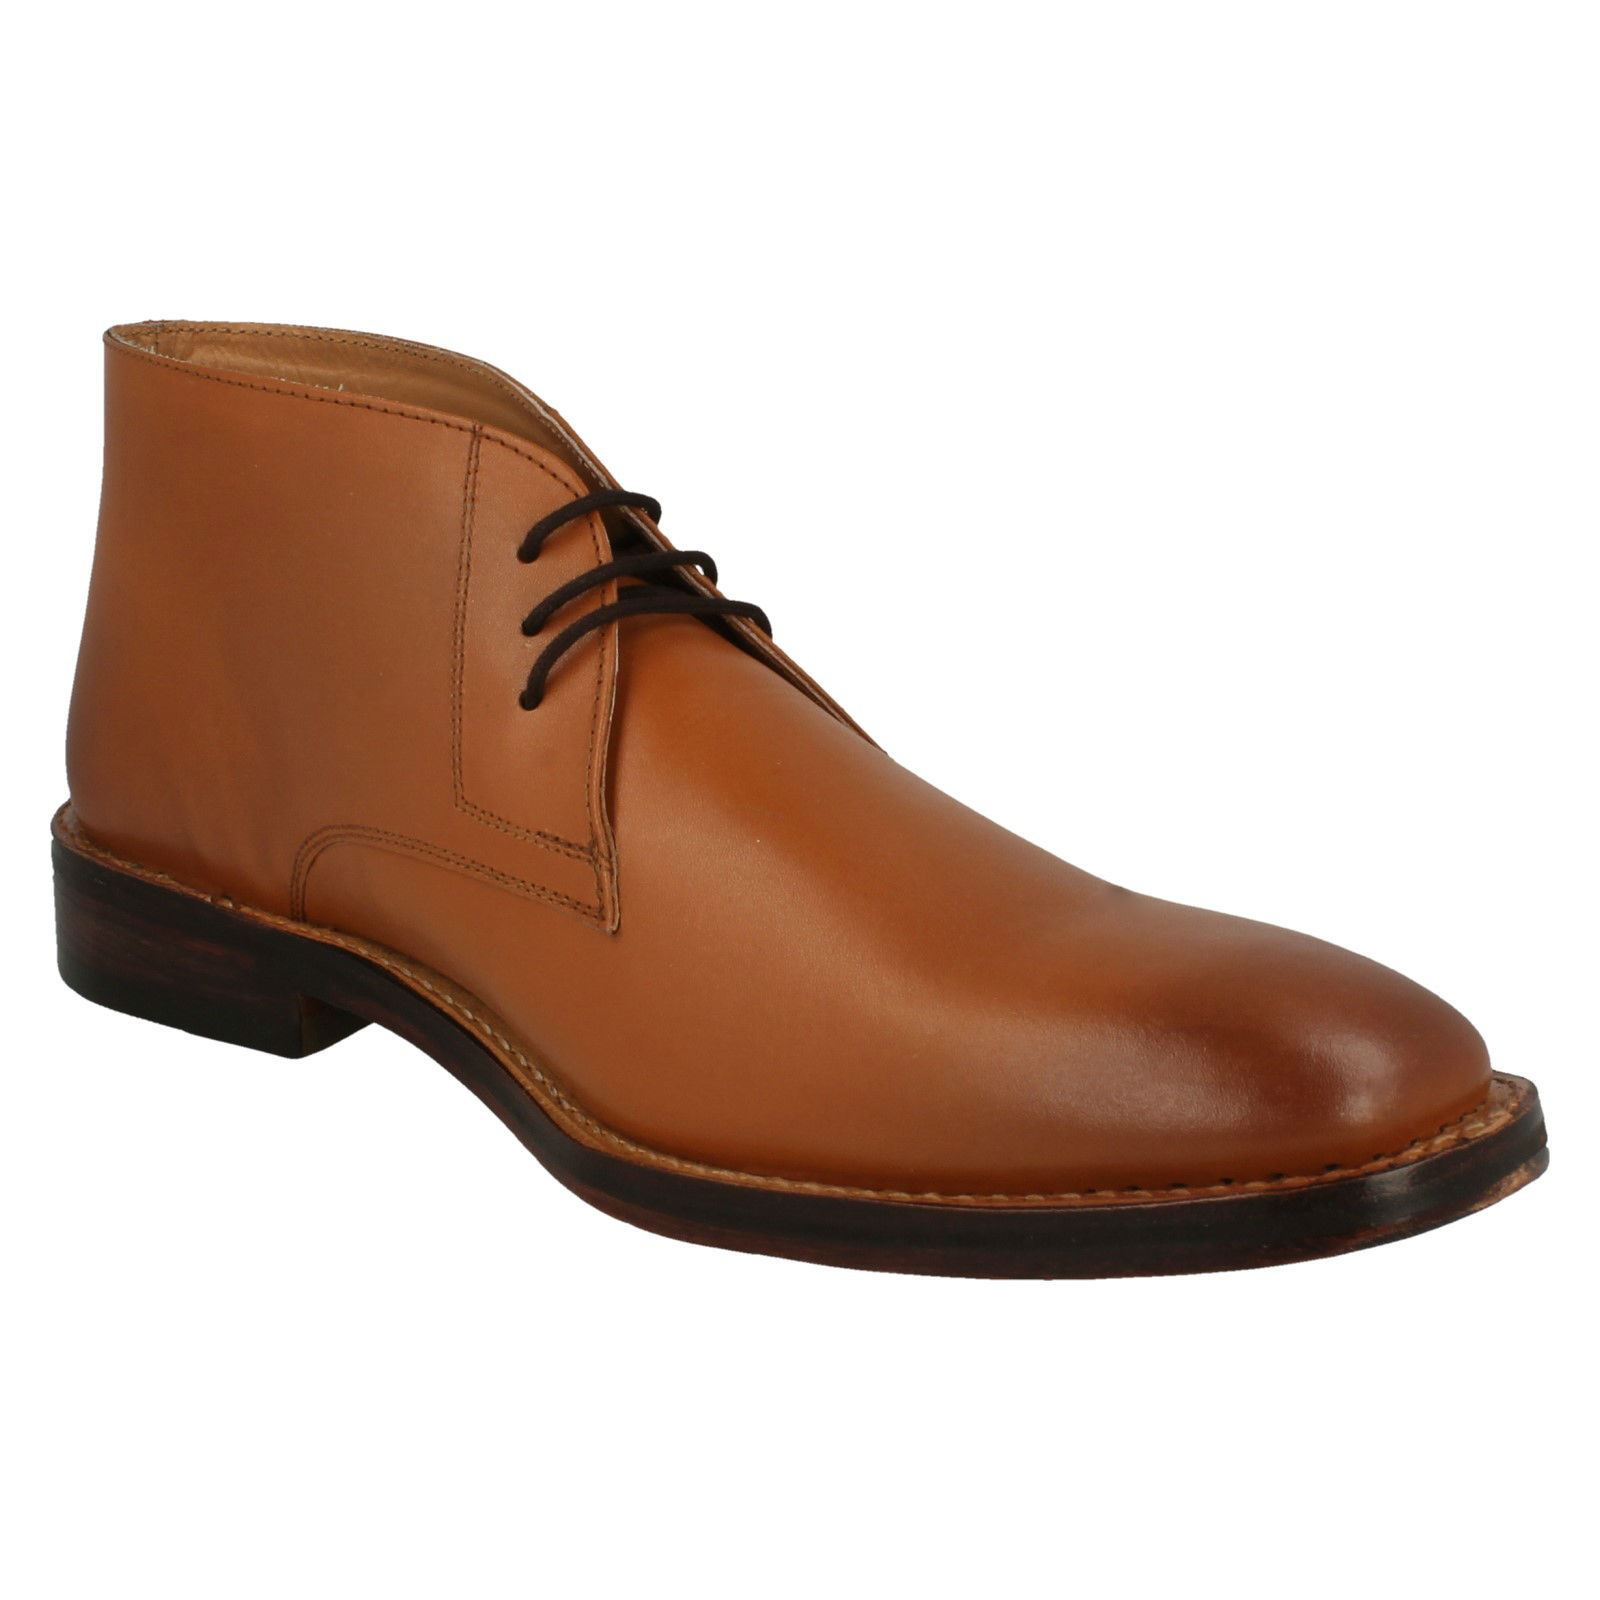 Mens-Catesby-Smart-Desert-Boot-MCW159T thumbnail 8